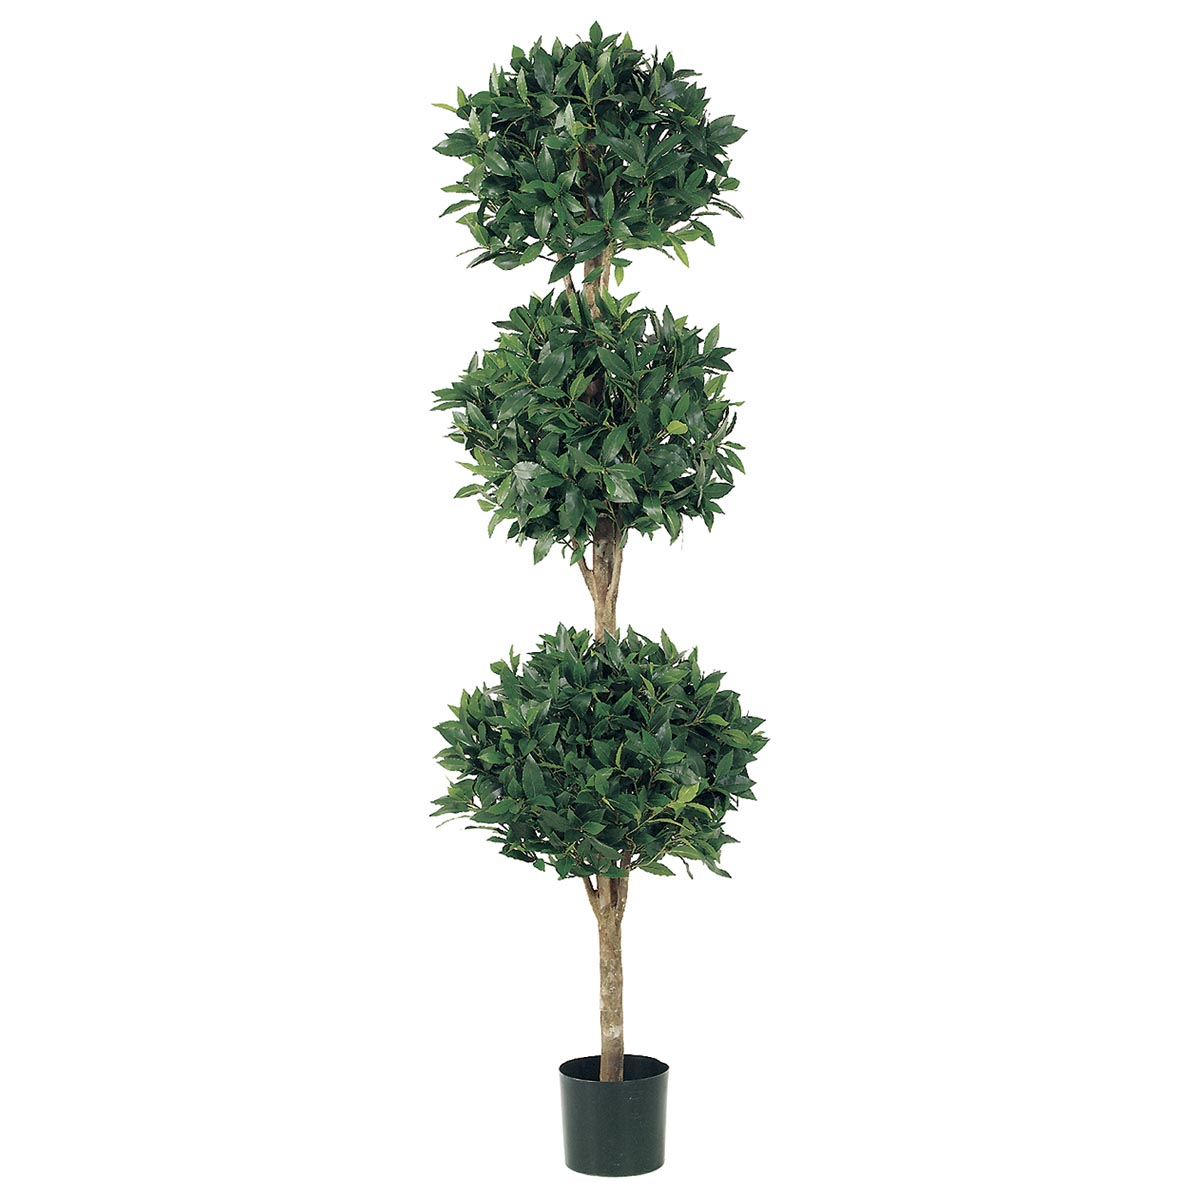 Choose Triple Ball Sweet Bay Topiary Limited Uv 9 1669